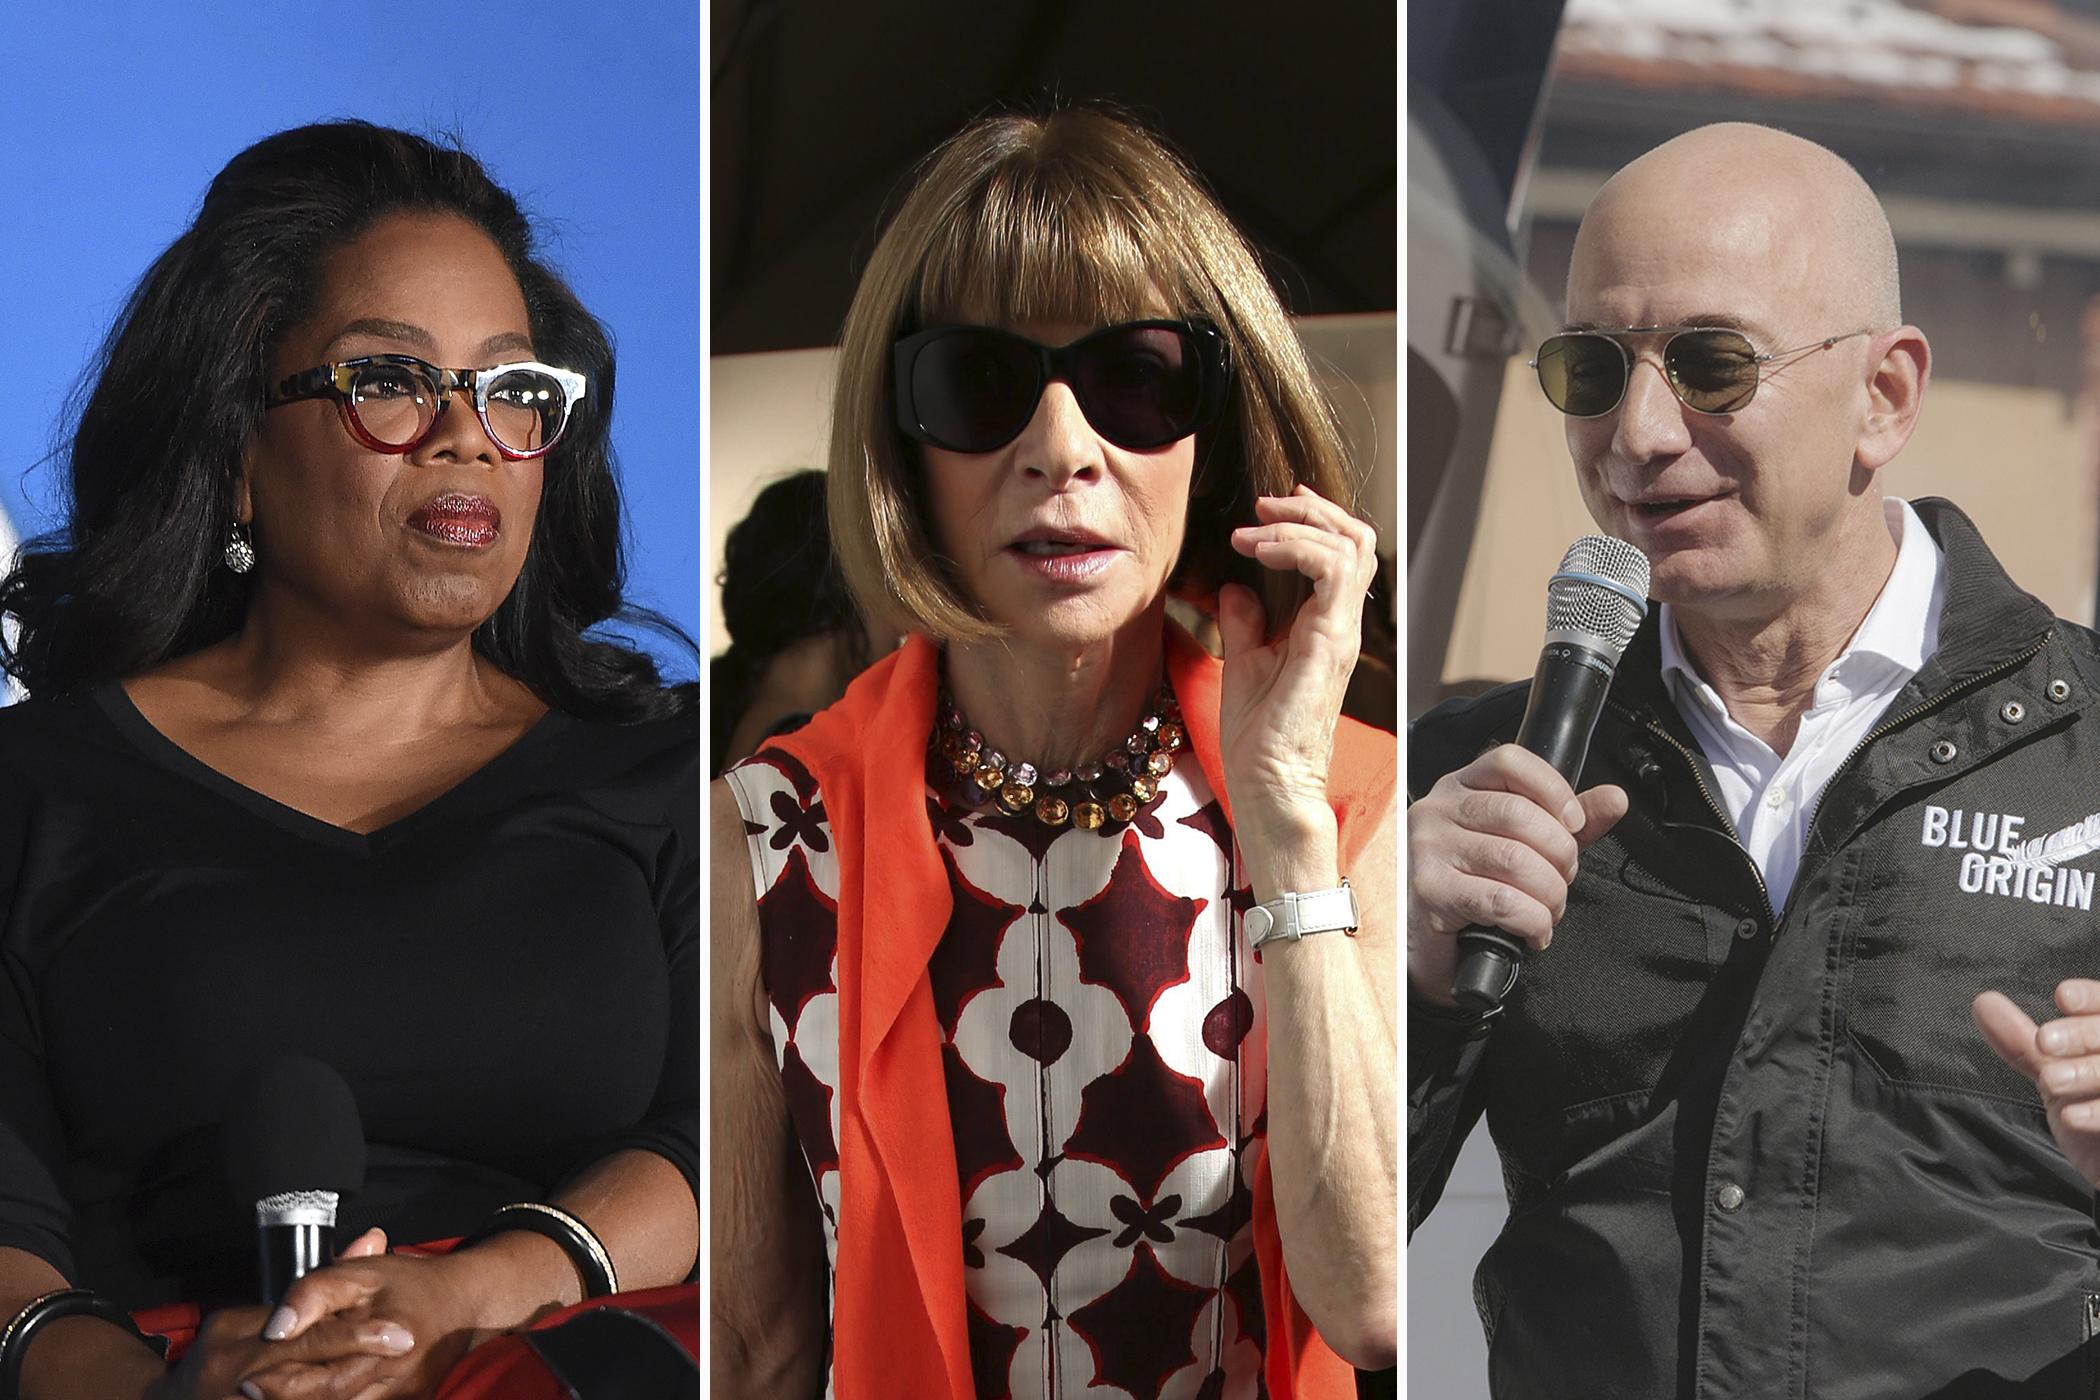 (left to right) Oprah Winfrey, Anna Wintour, Jeff Bezos